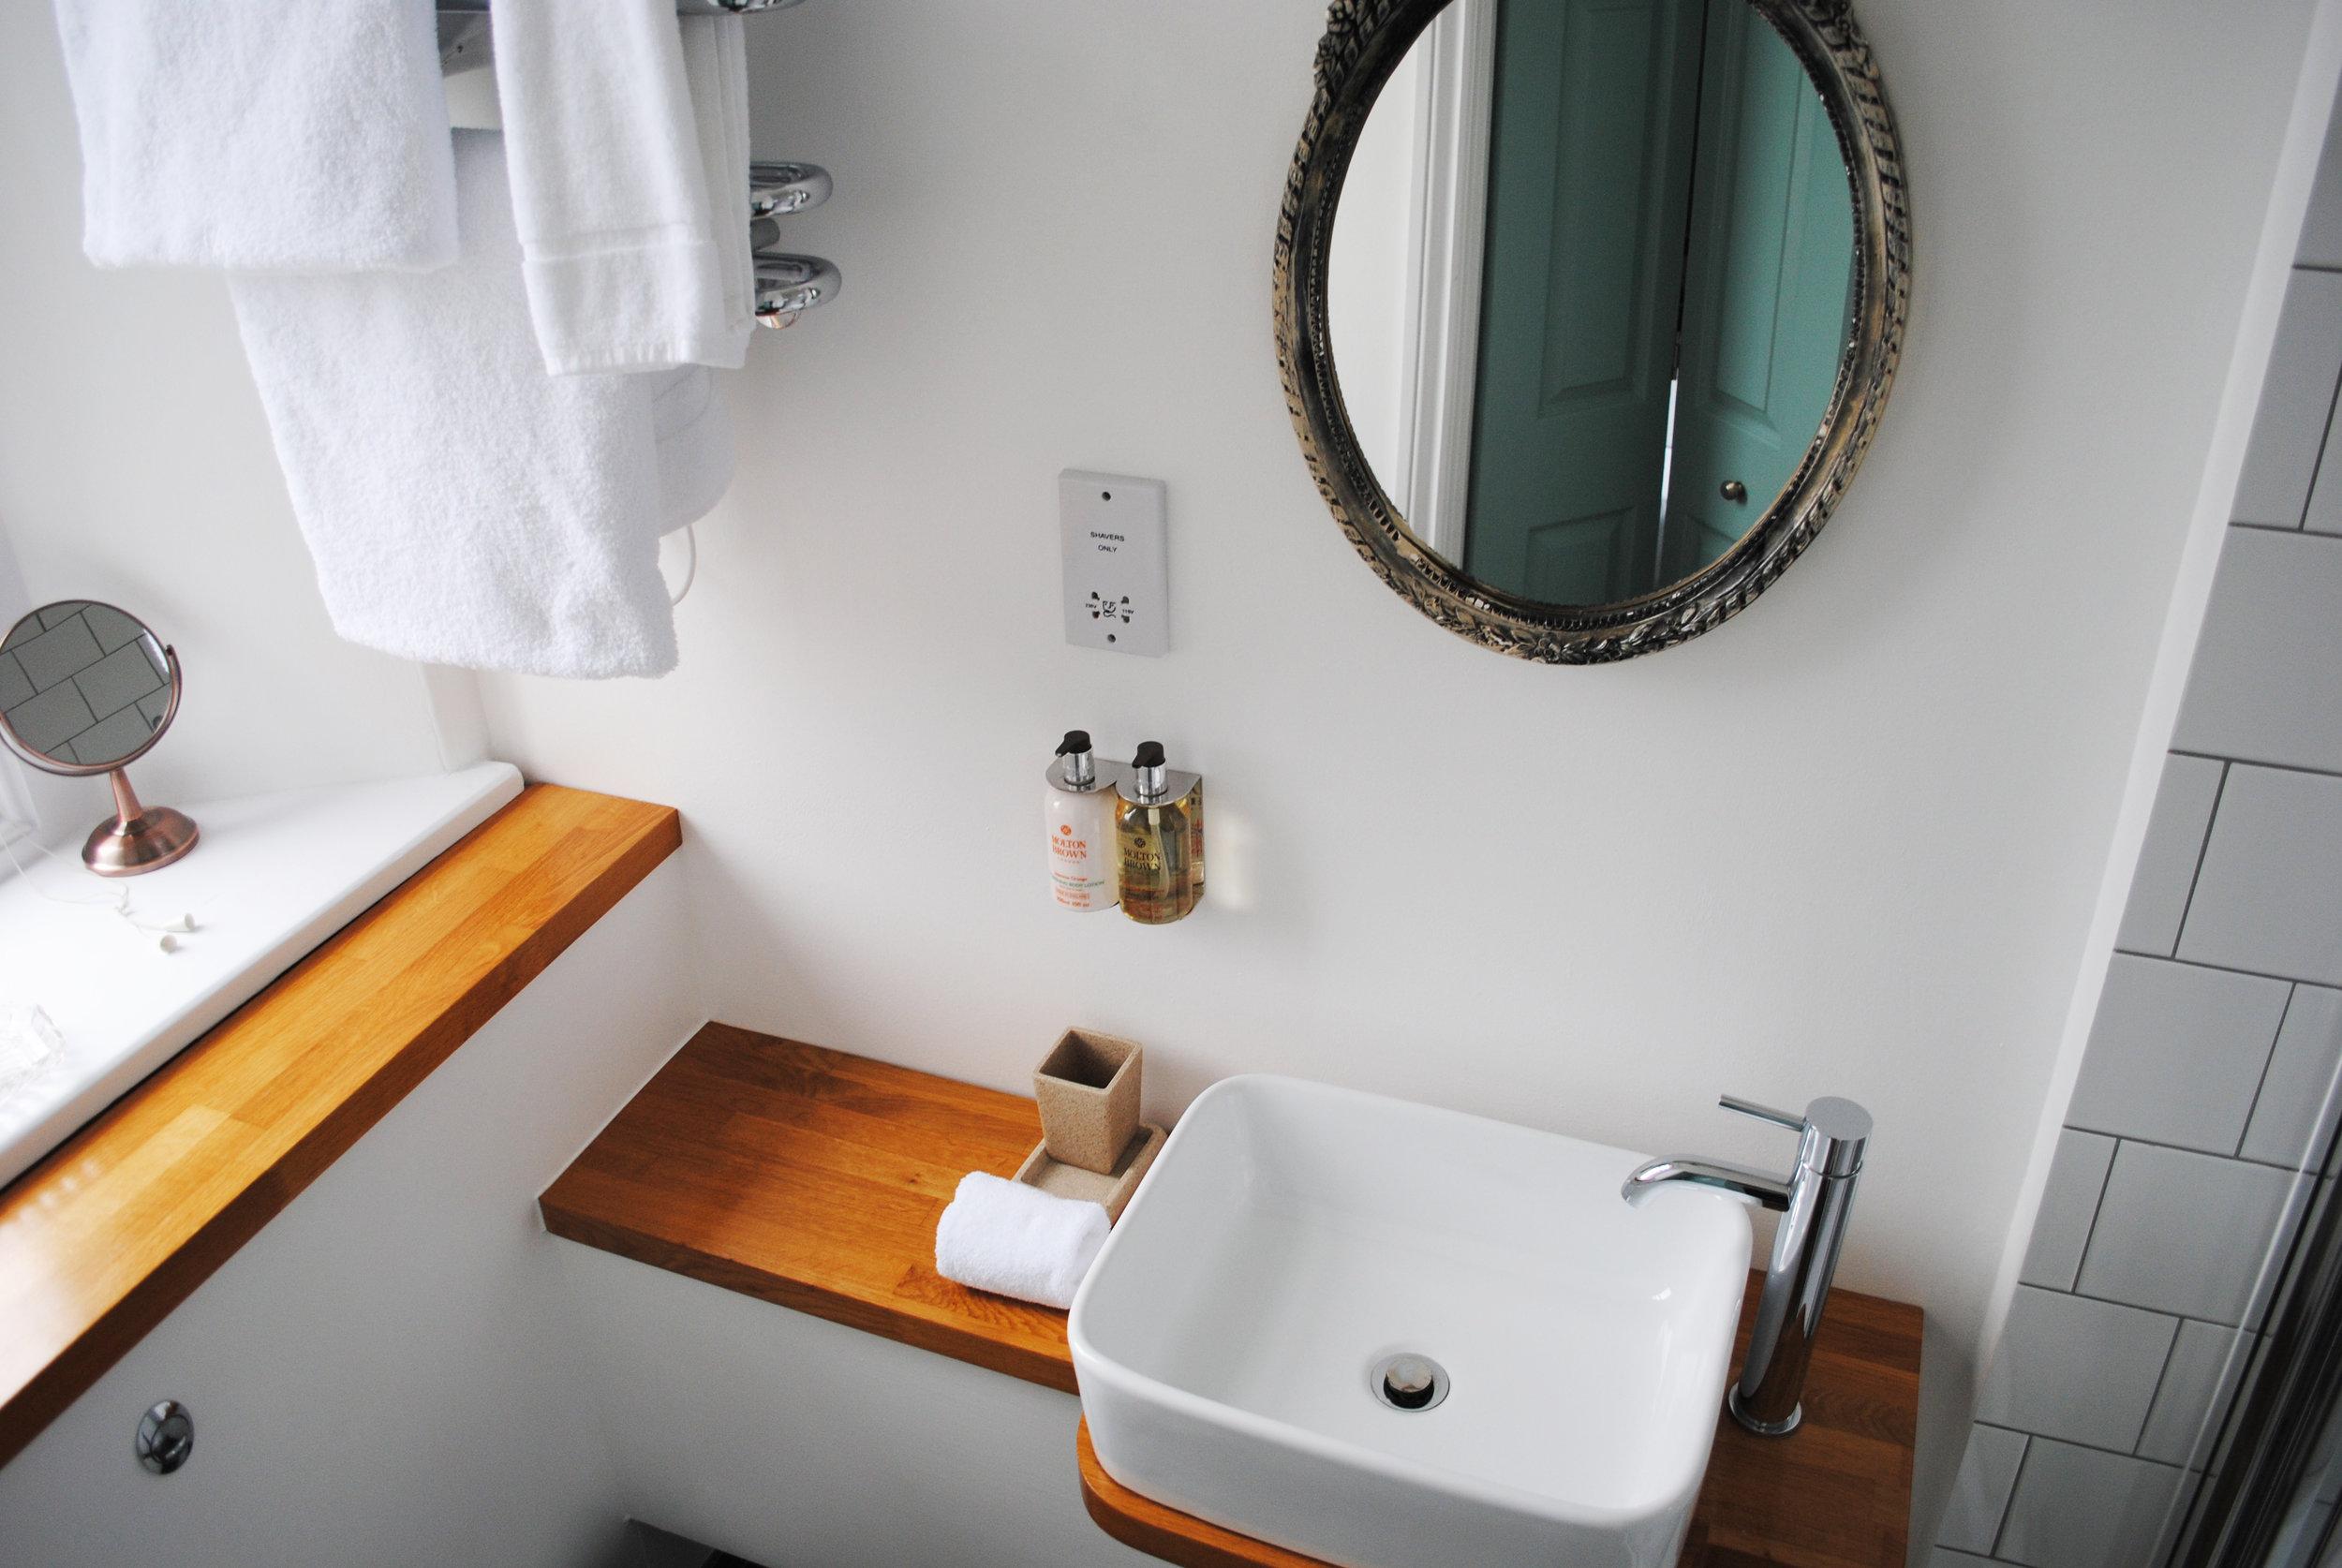 rm1 bathroom top view 2.jpg